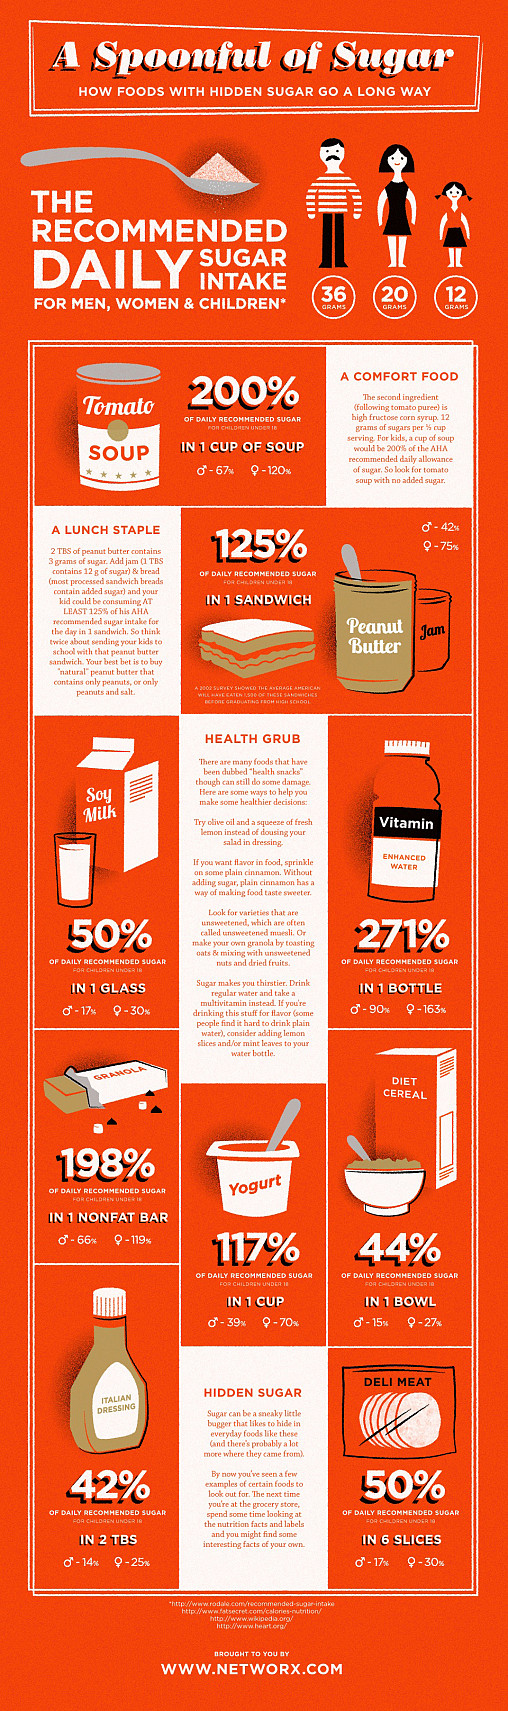 Healthy Foods That Contain Hidden Sugar